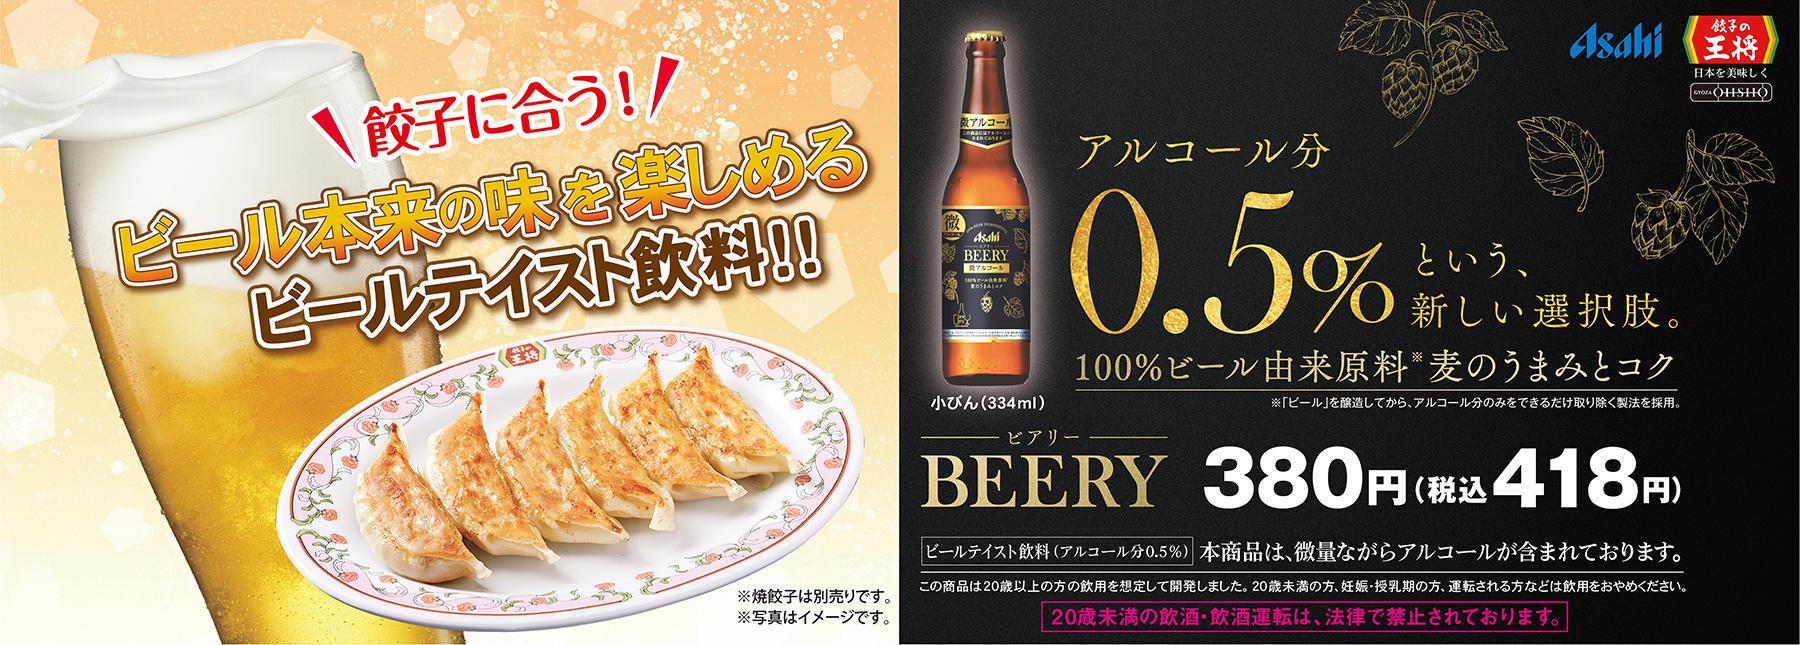 beery_HP_info.jpg